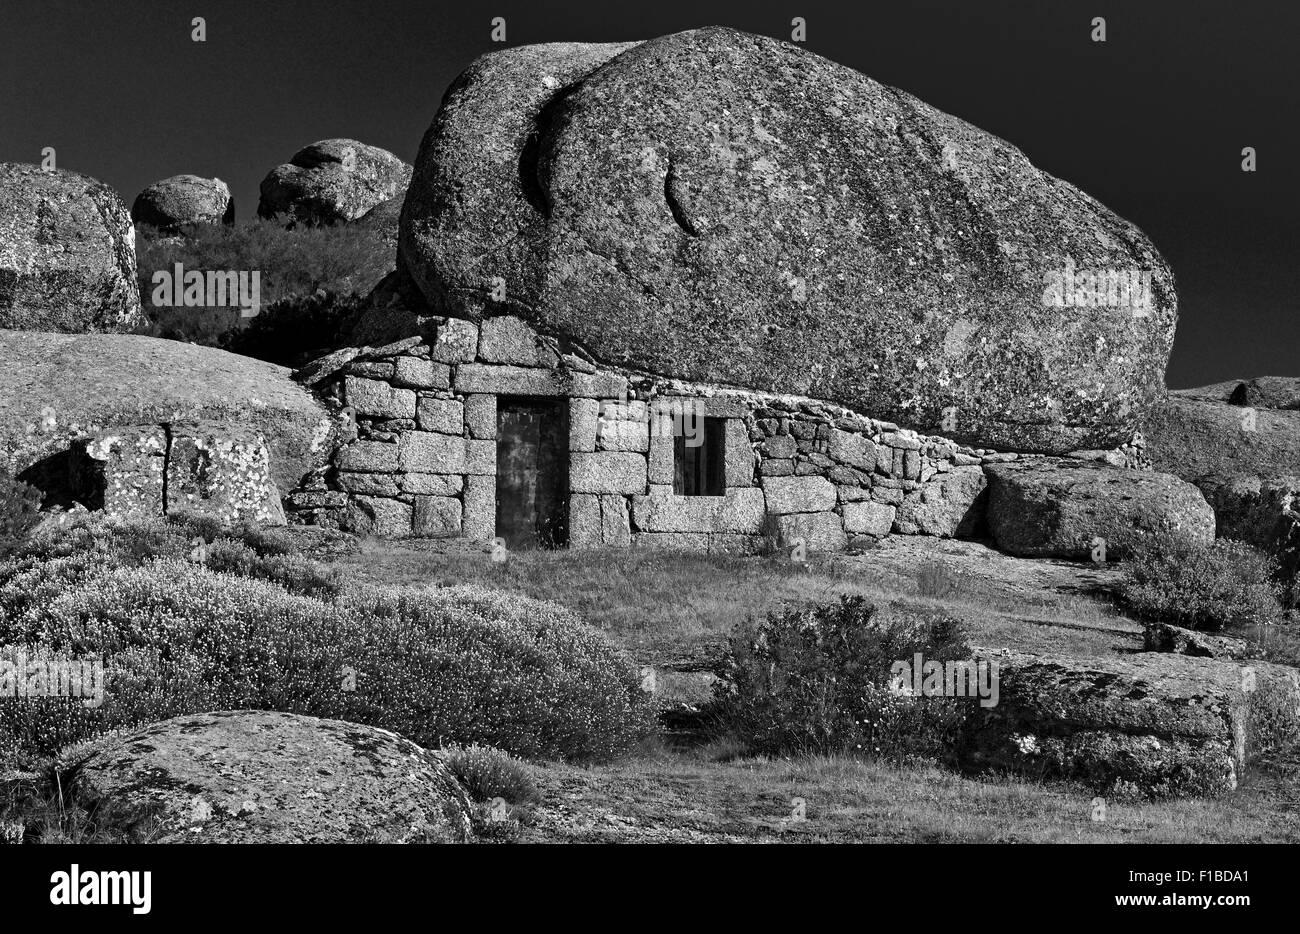 Portugal, Serra da Estrela: House under the Rocks (bw) - Stock Image